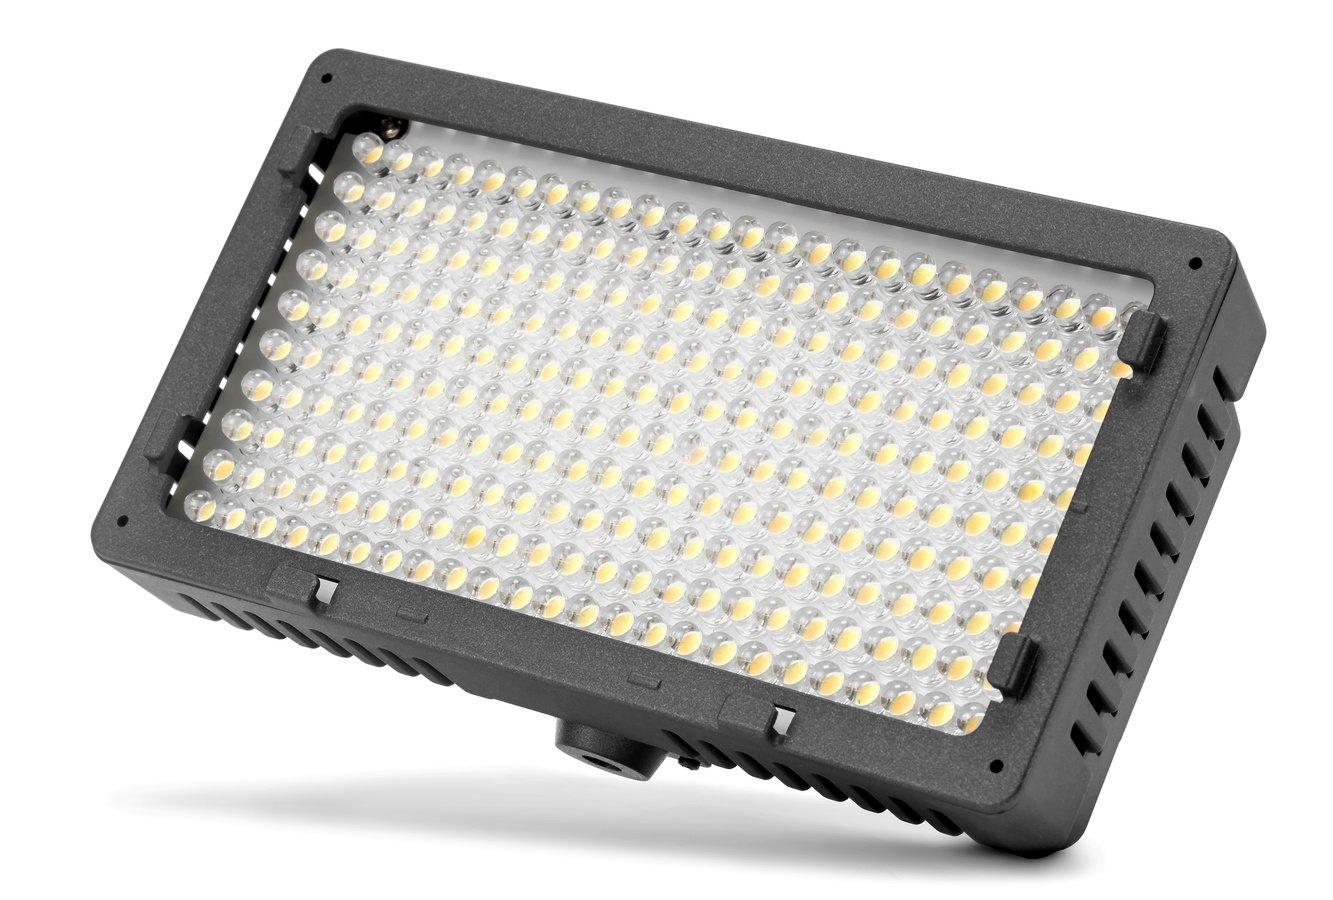 Luxotron CN-240CH BiColor LED Akkuleuchte mit CRI 95+ und 1000lx / 1m.